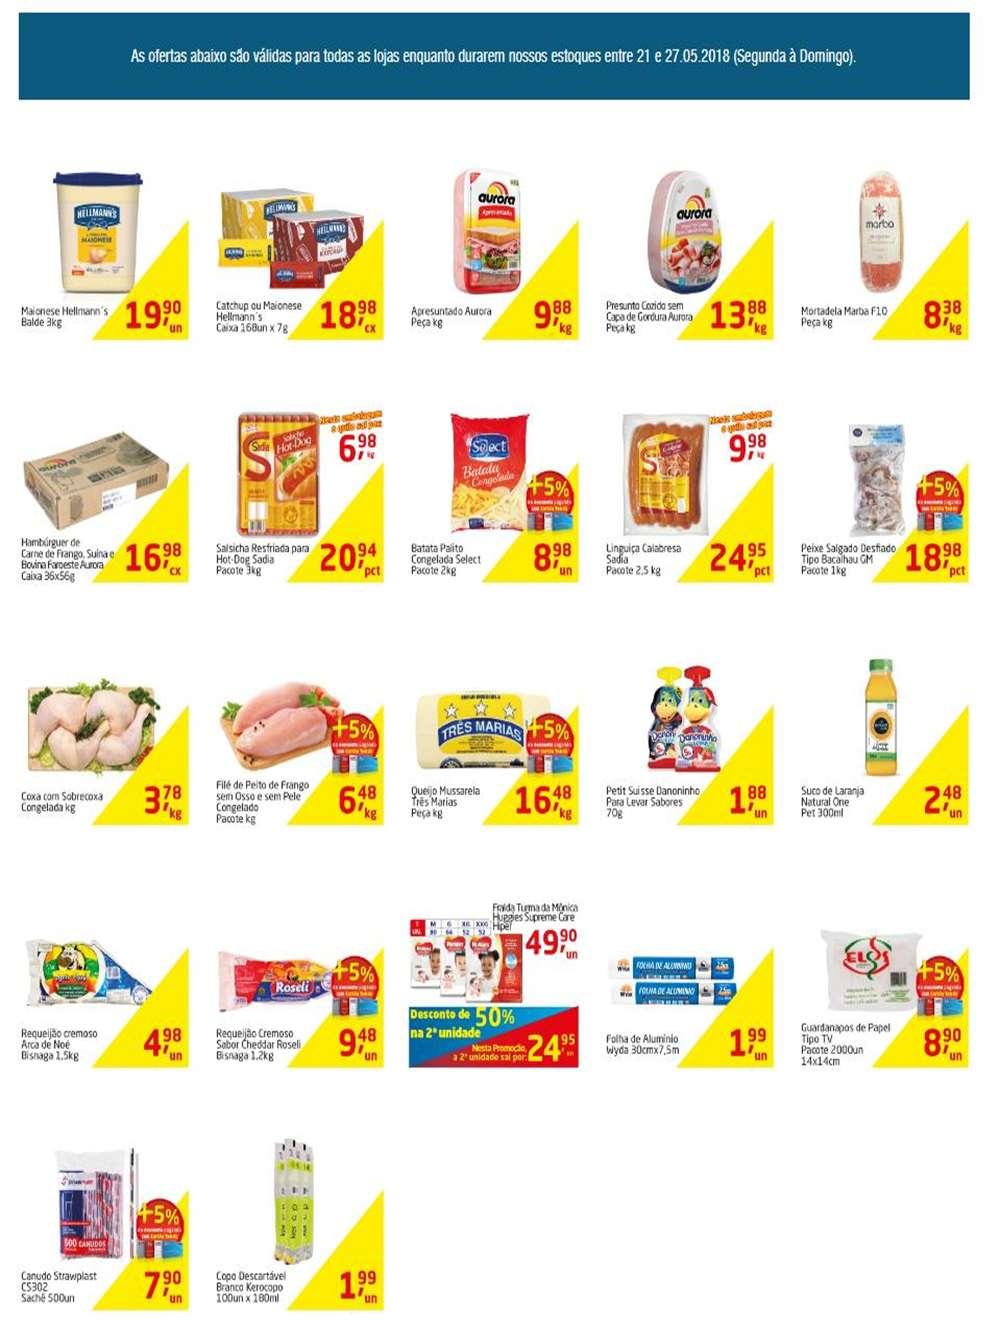 Ofertas-tenda1-1 Ofertas de Supermercados